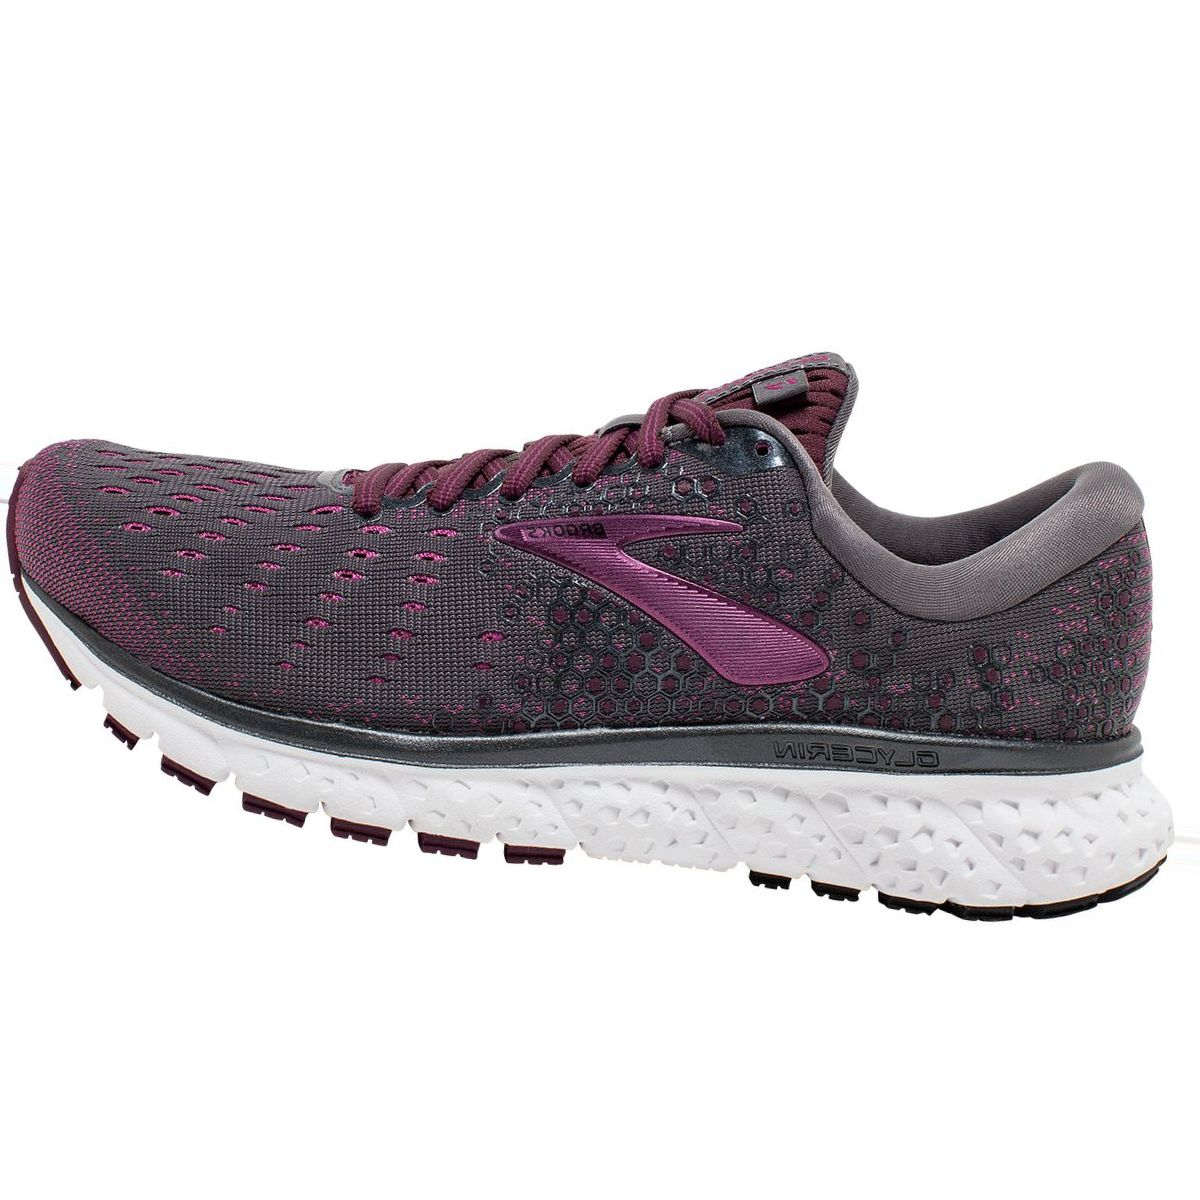 Brooks Glycerin 17 Running Shoe - Women's